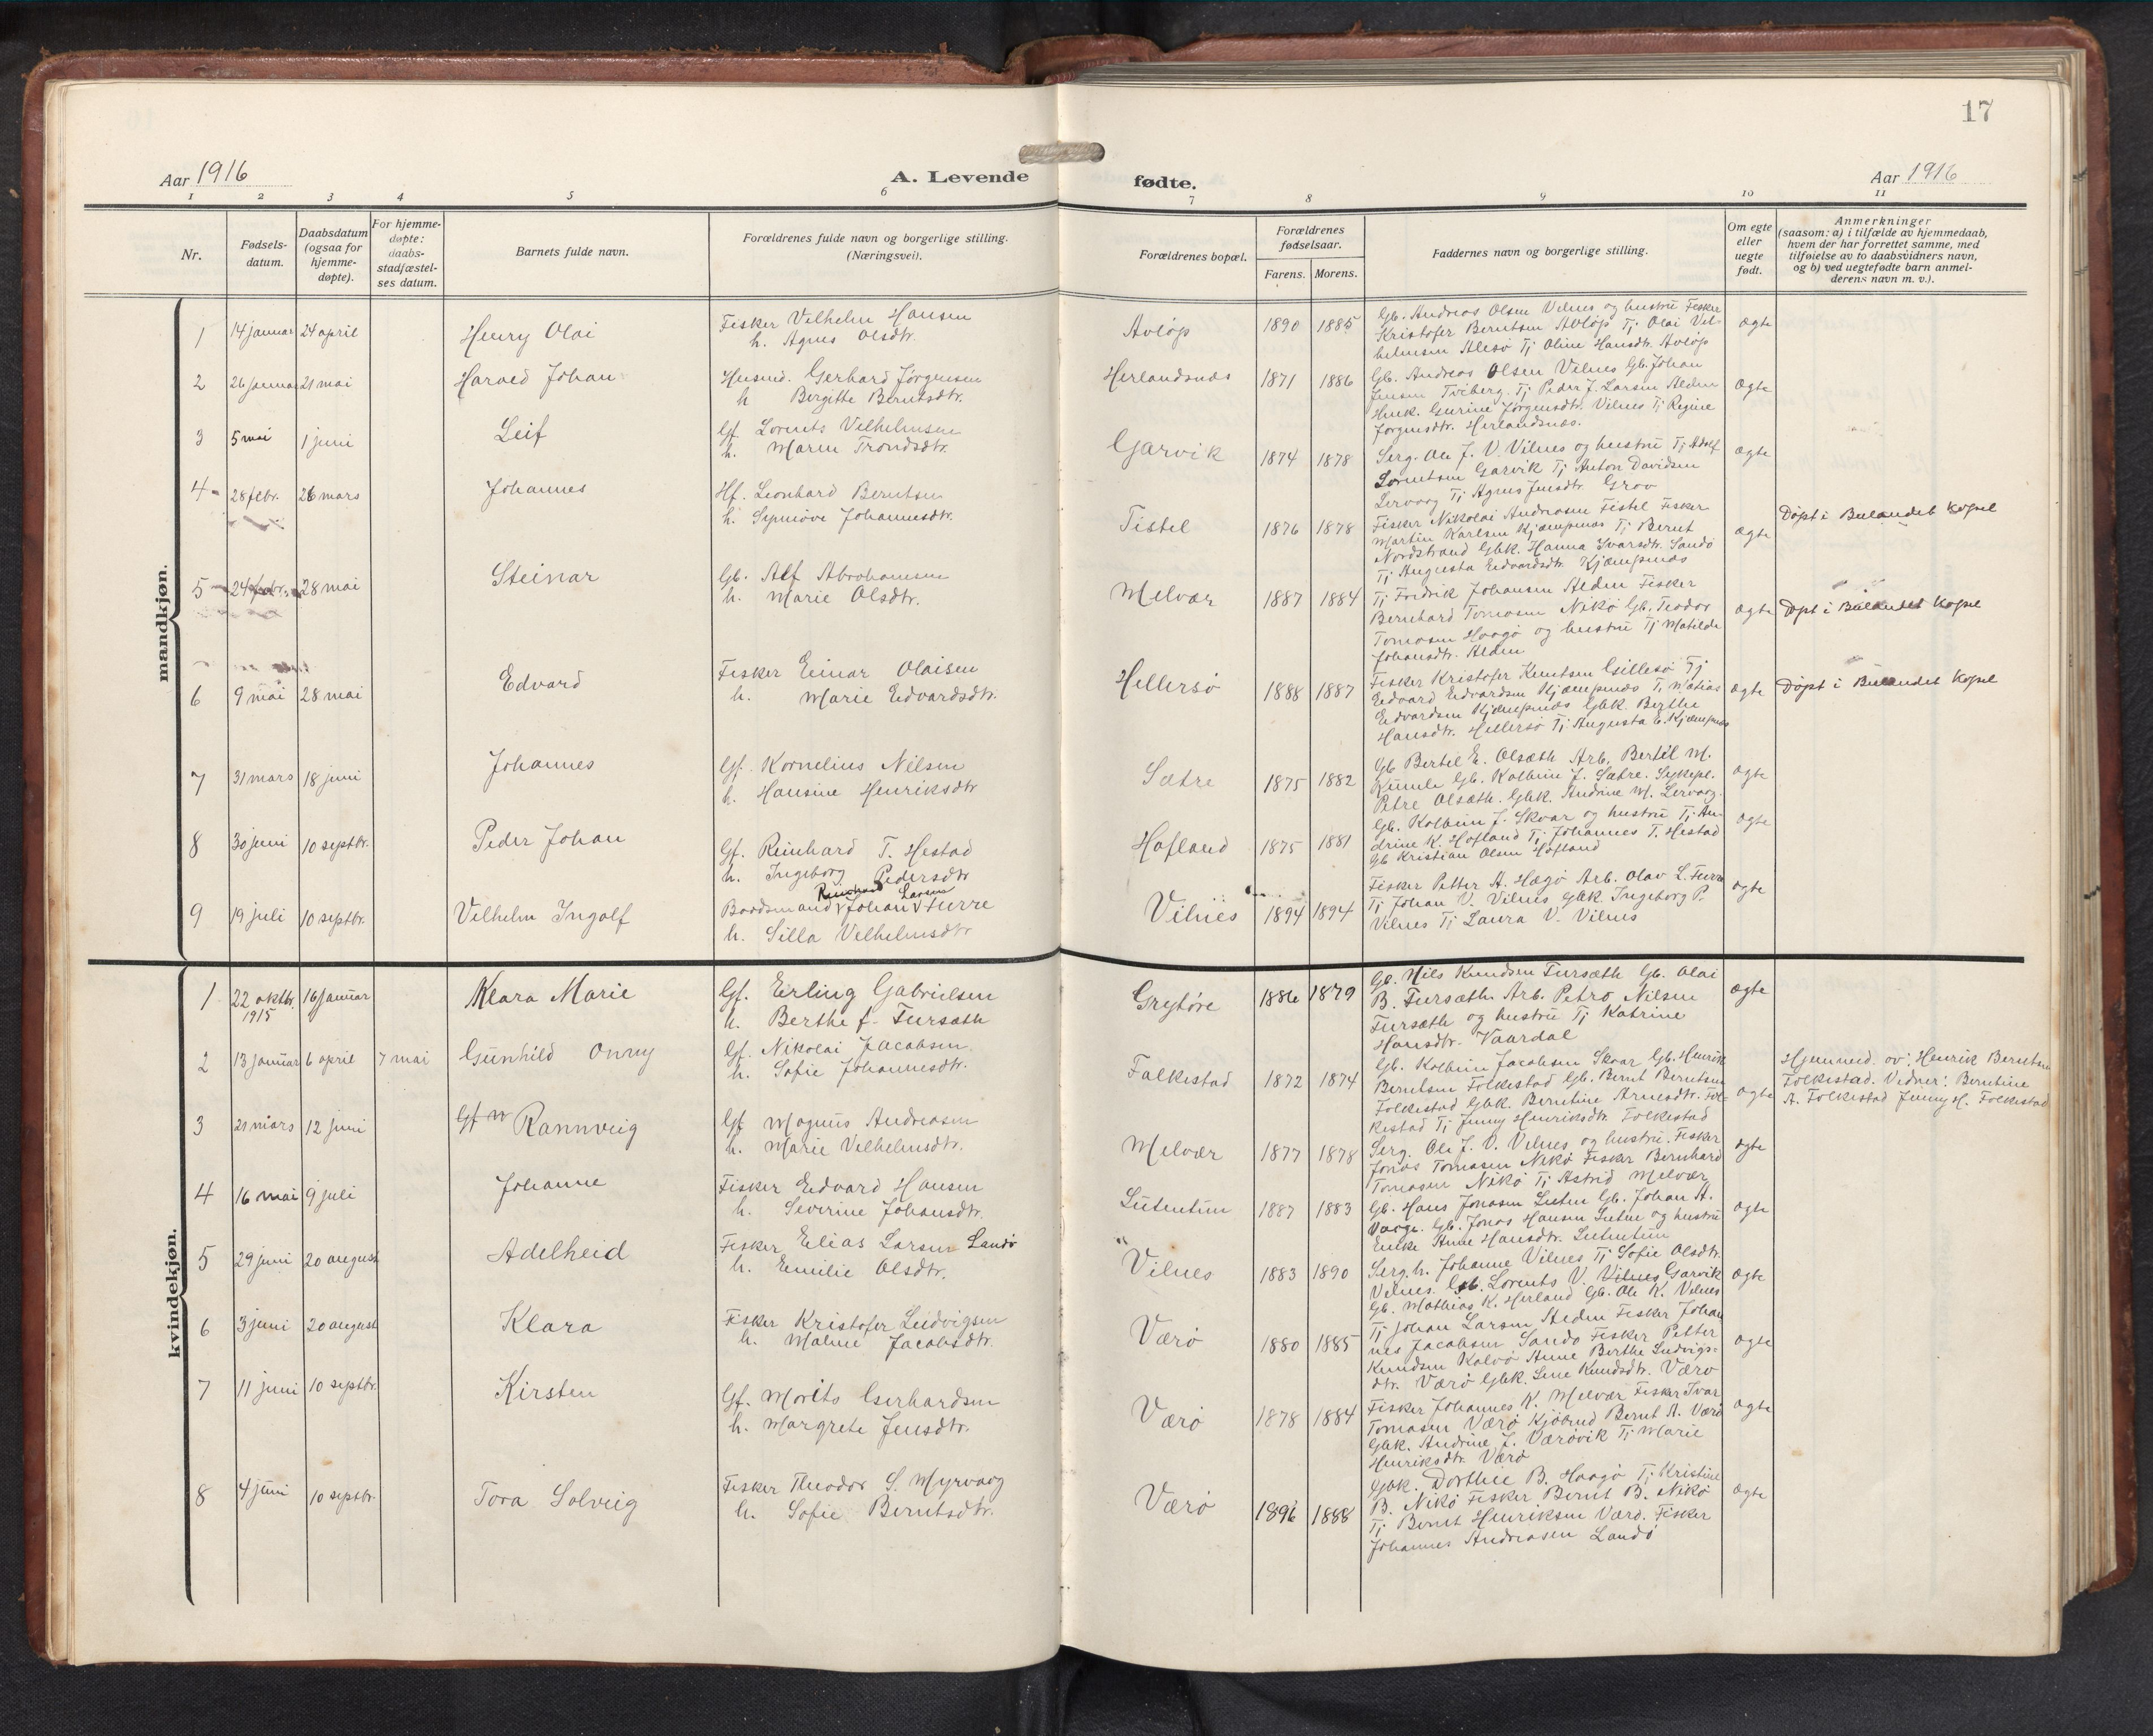 SAB, Askvoll sokneprestembete, H/Hab/Habb/L0002: Klokkerbok nr. B 2, 1910-1947, s. 16b-17a